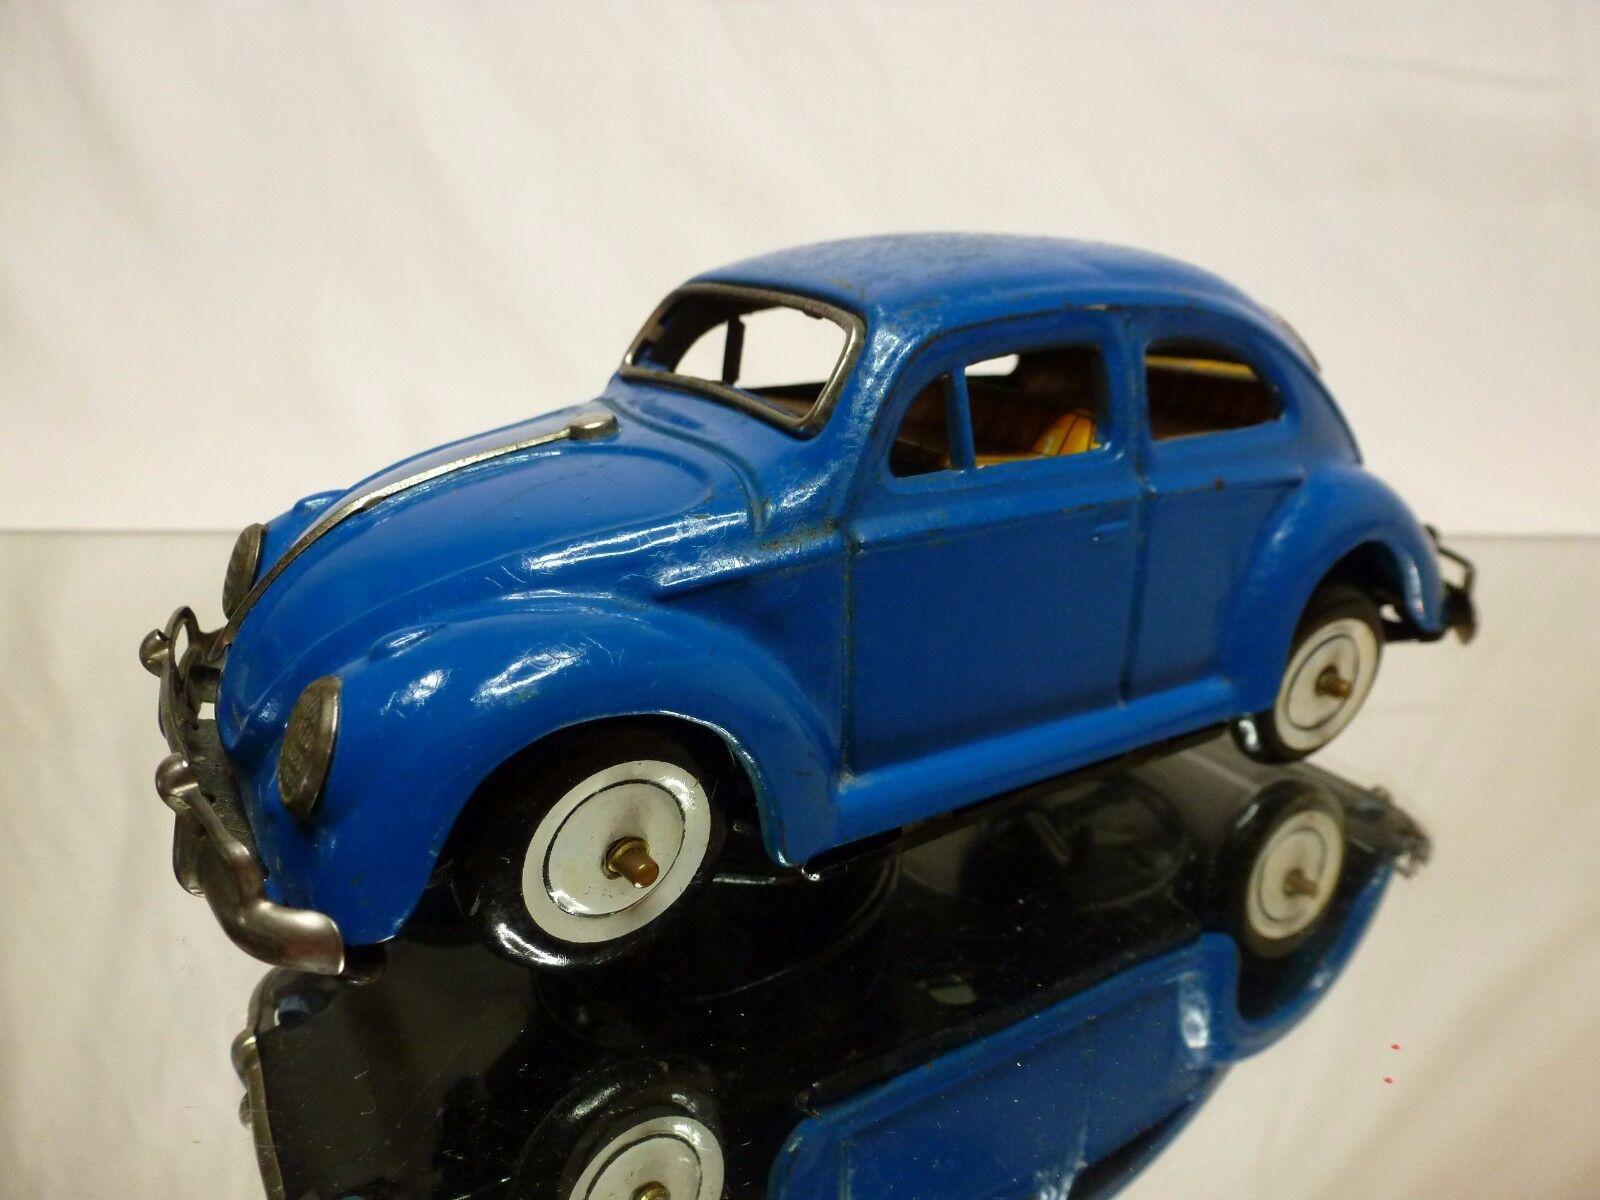 KO JAPAN TIN TOYS BLECH VW VOLKSWAGEN BEETLE - blu L16.5cm - GOOD - WINDUP RARE